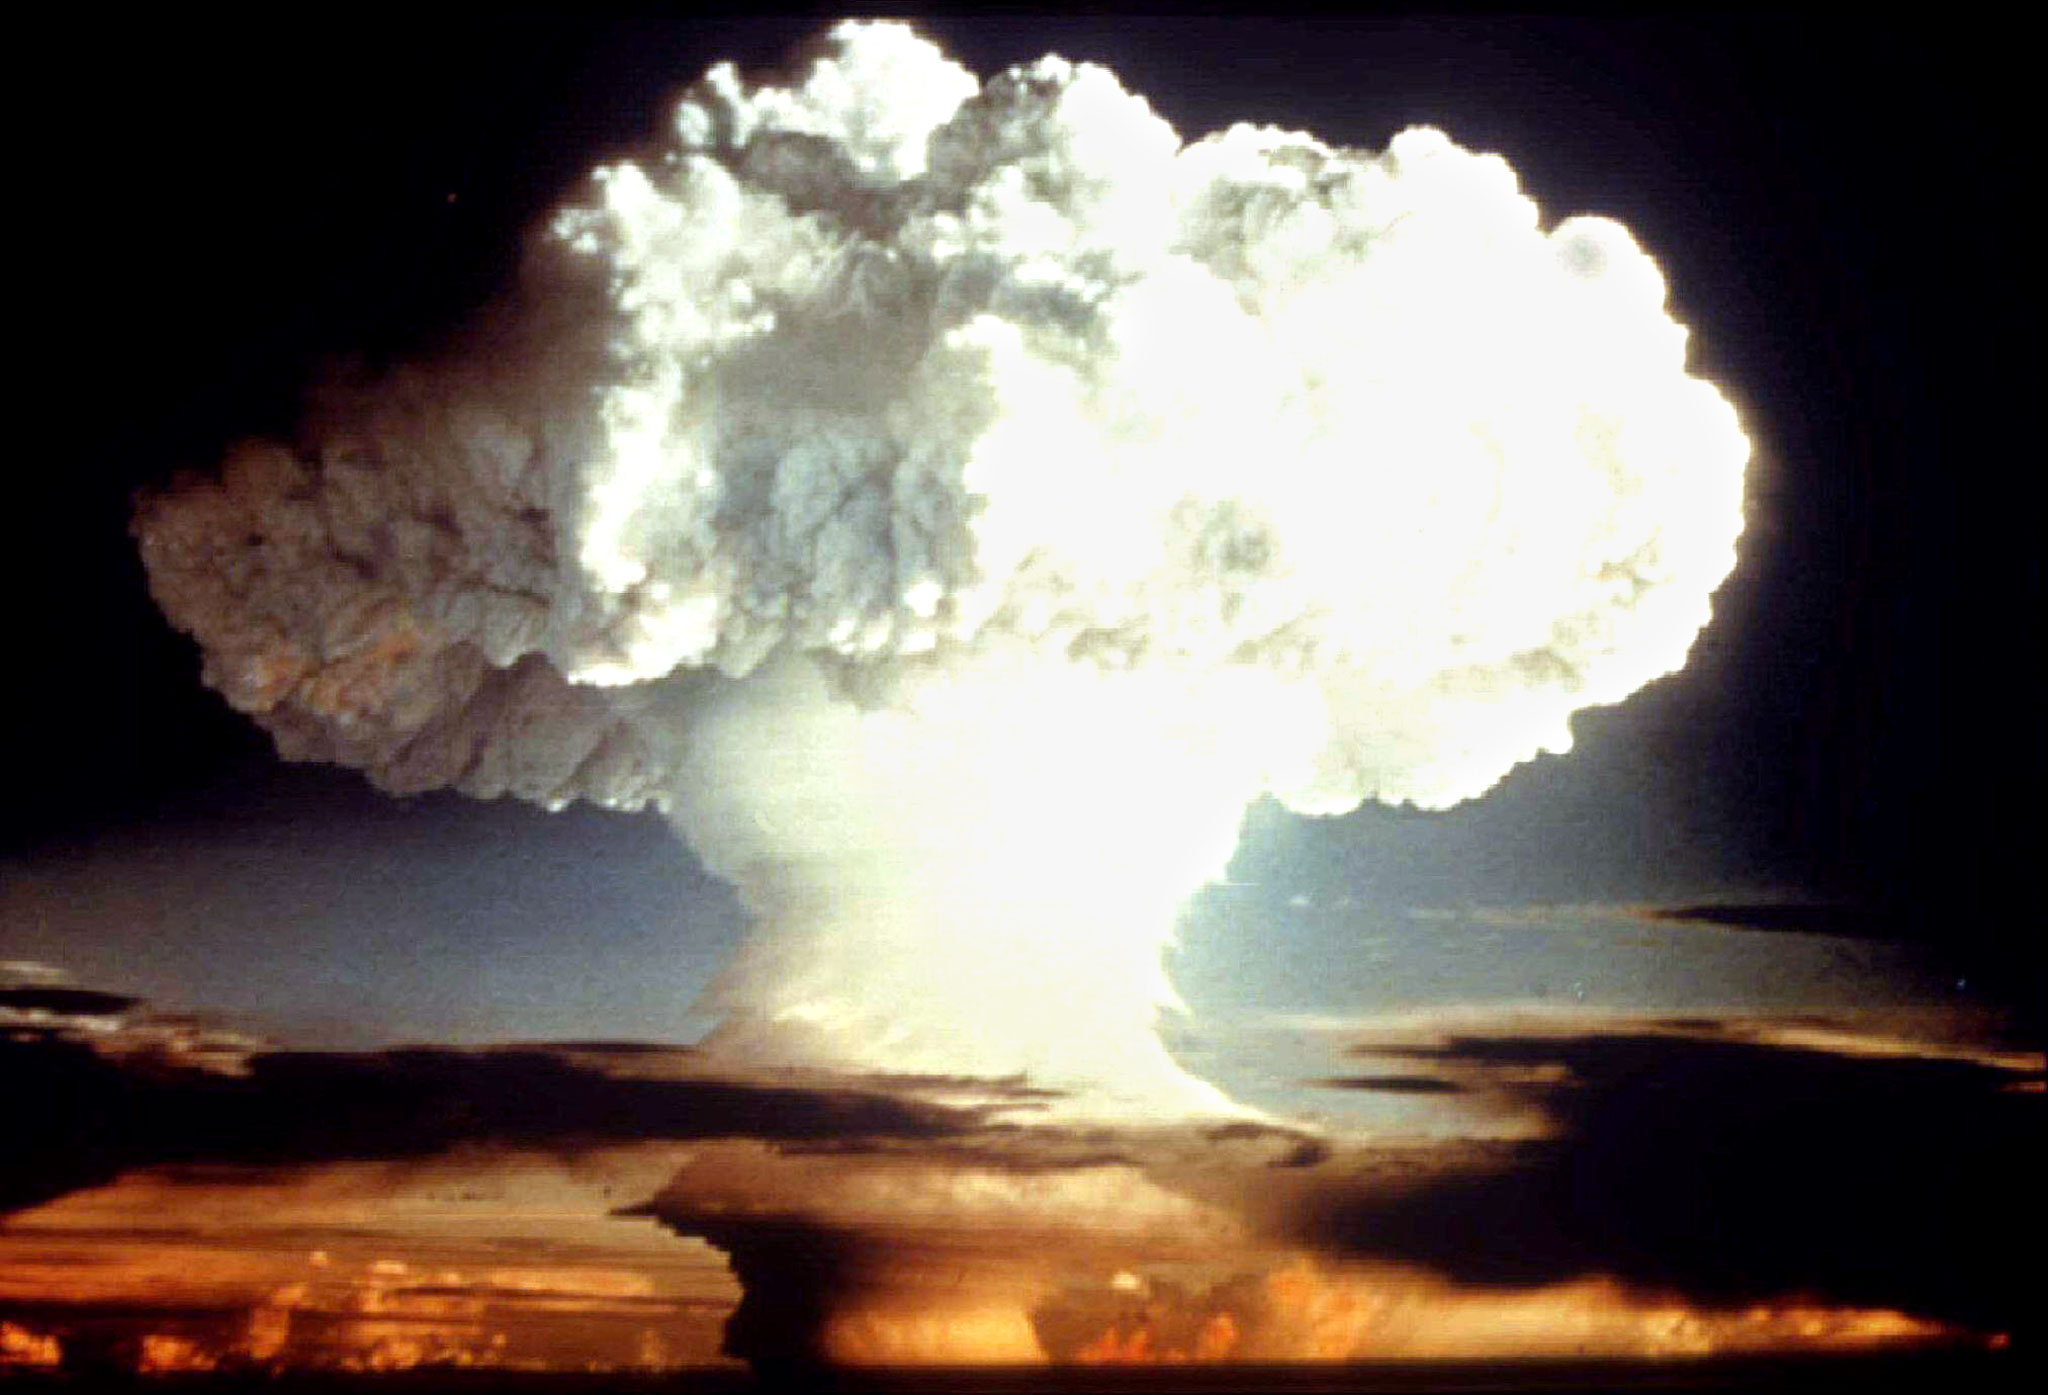 A mushroom cloud from a nuclear bomb.